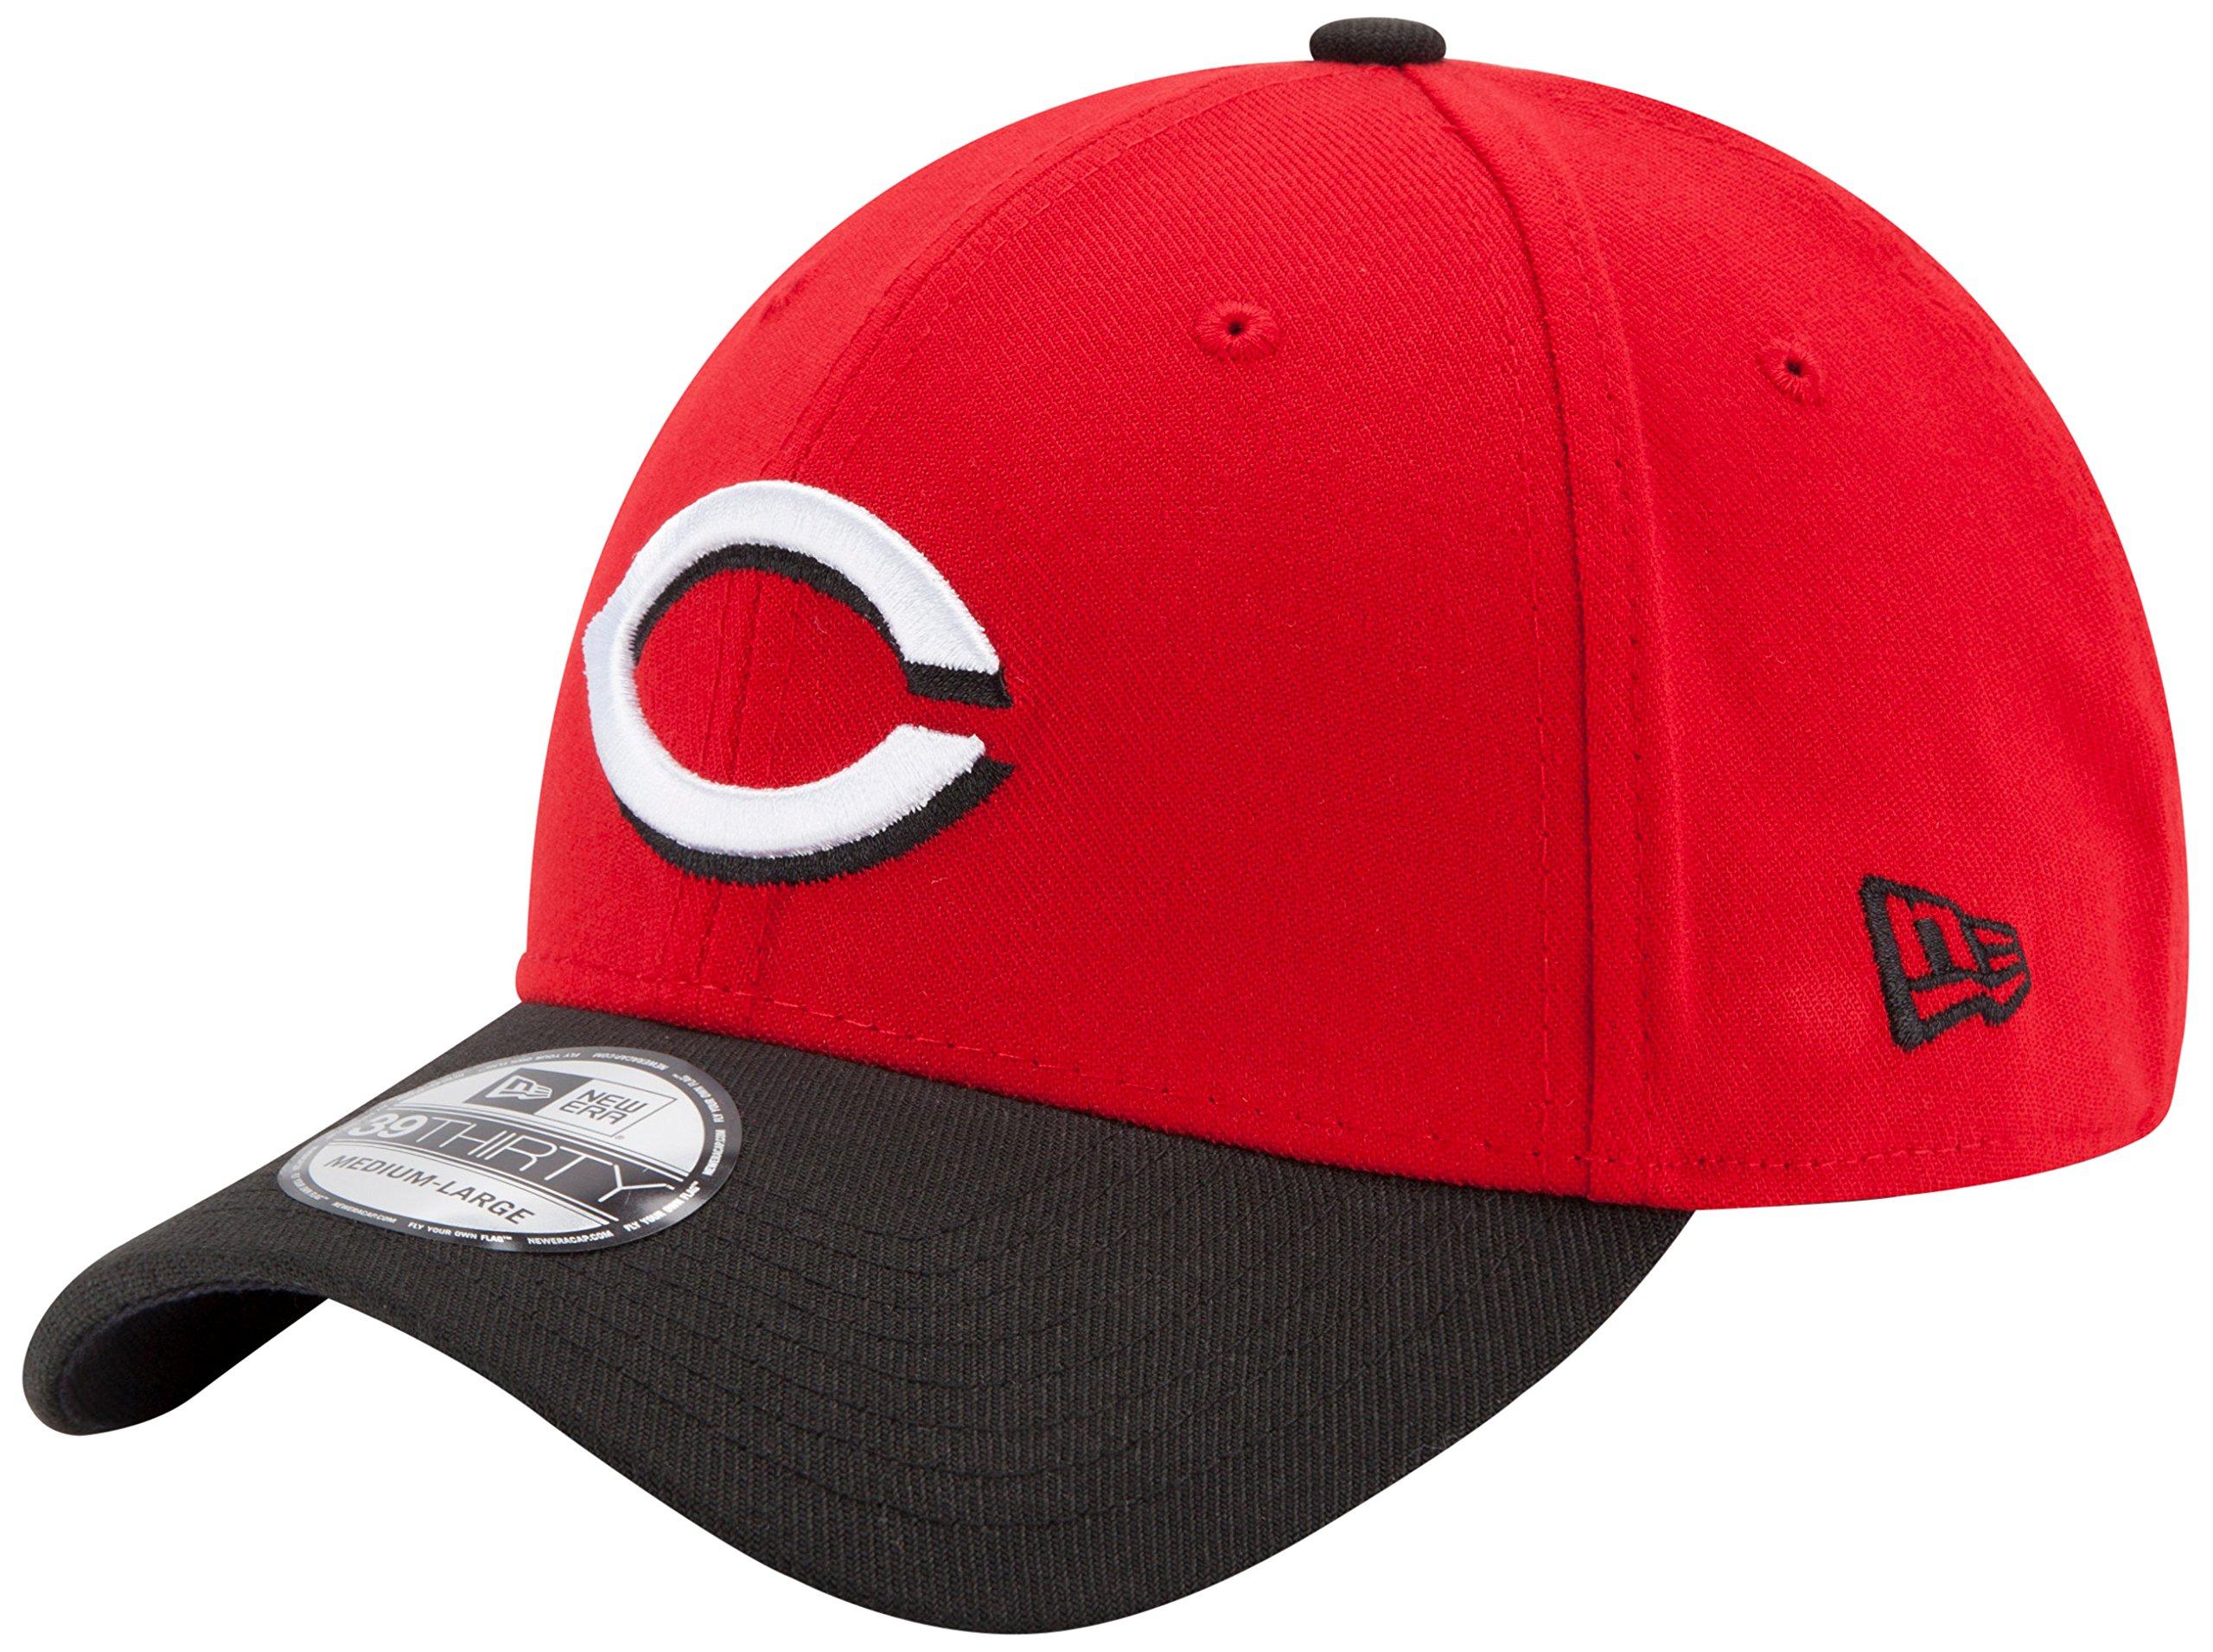 New Era MLB Cincinnati Reds Team Classic Road 39Thirty Stretch Fit Cap, Red, Large/X-Large